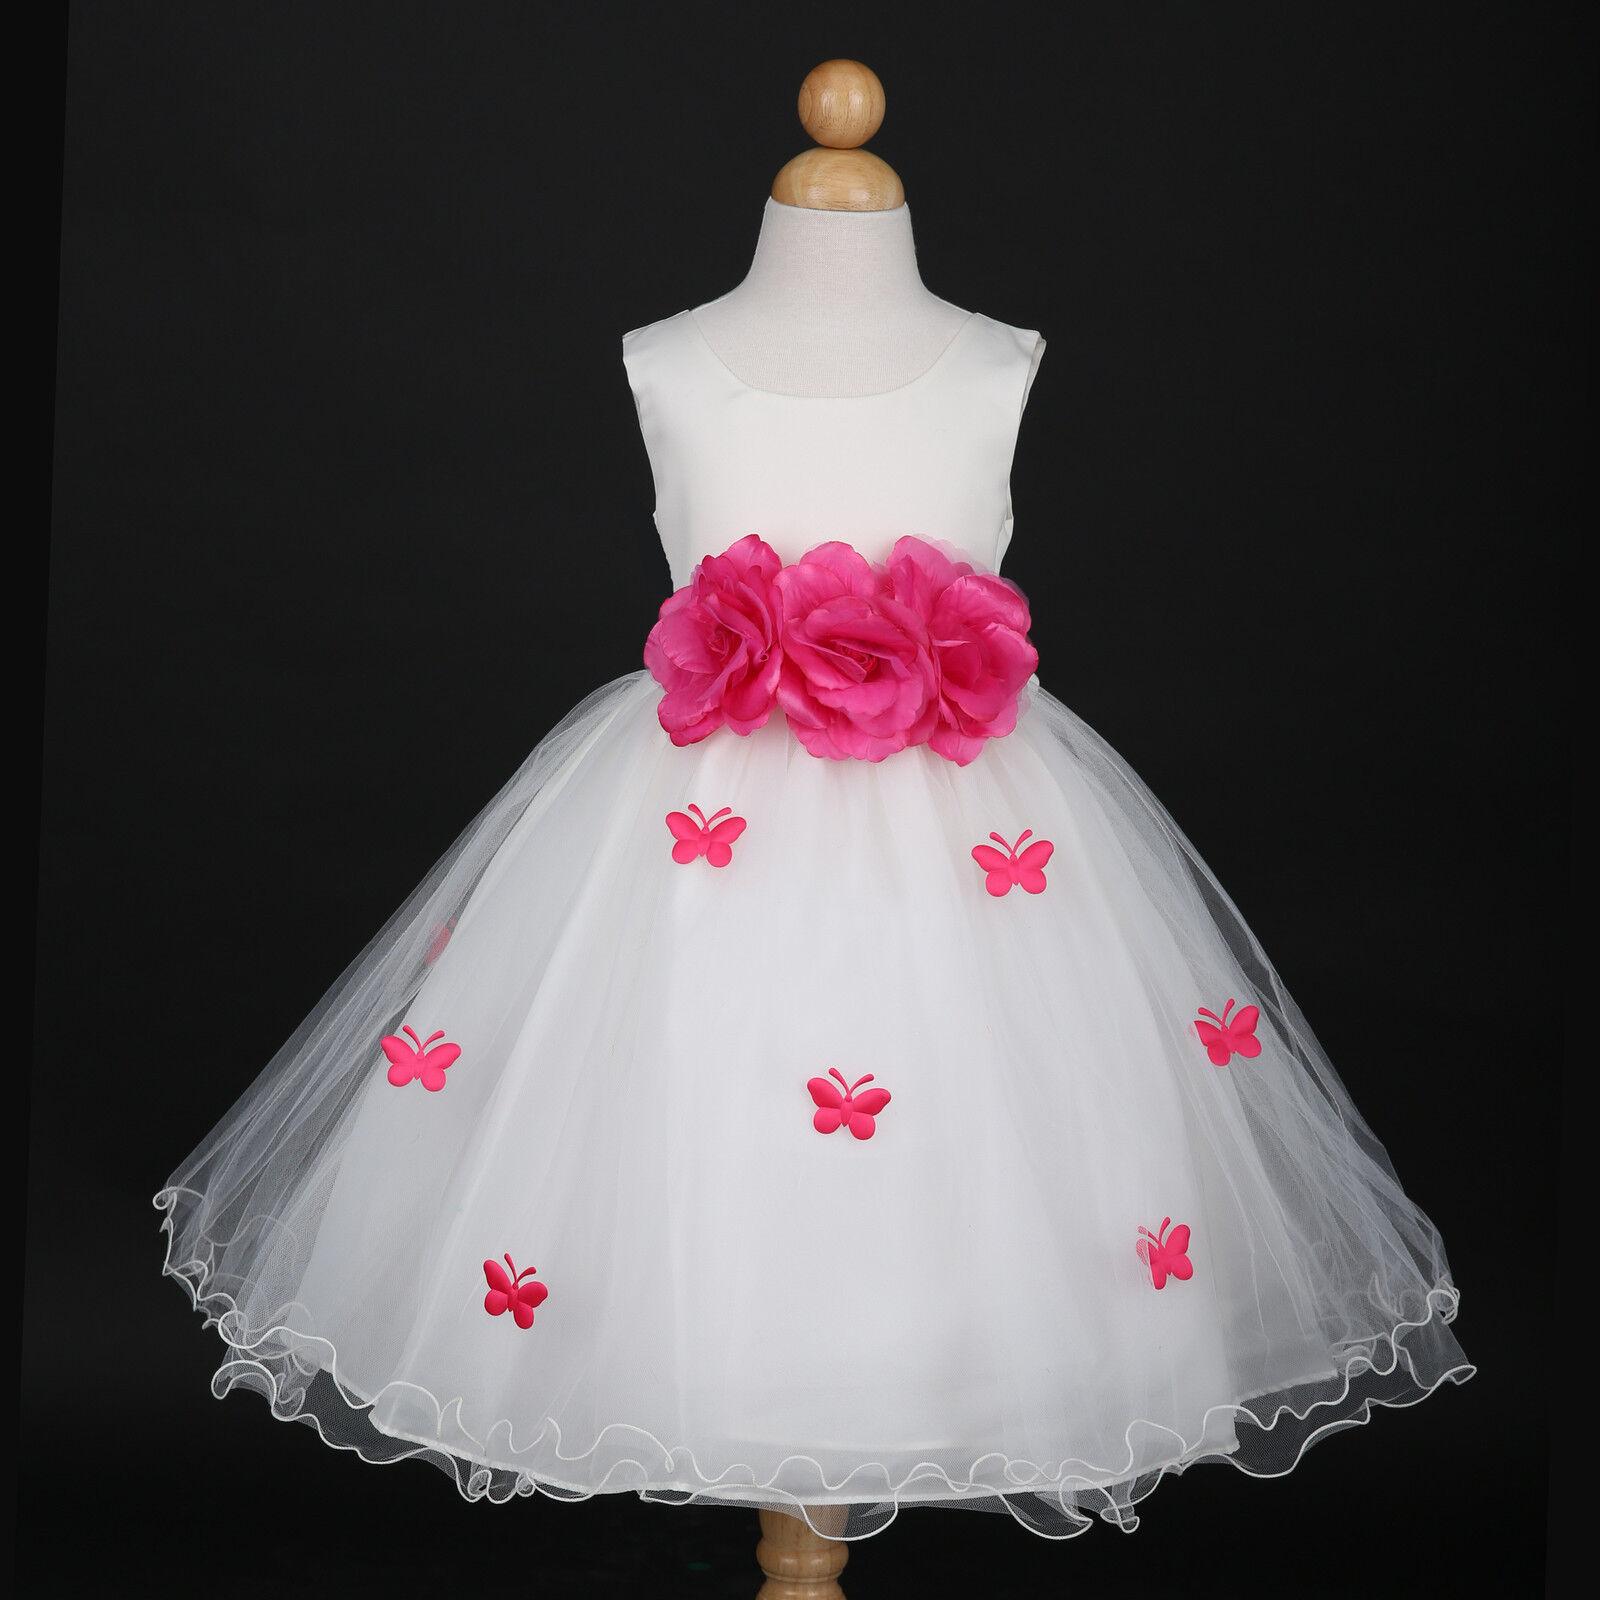 Ivory/Fuchsia Hot Pink Petals Wedding Flower Girl Dress 6M 12M 18M 2 3/4 6 8 10